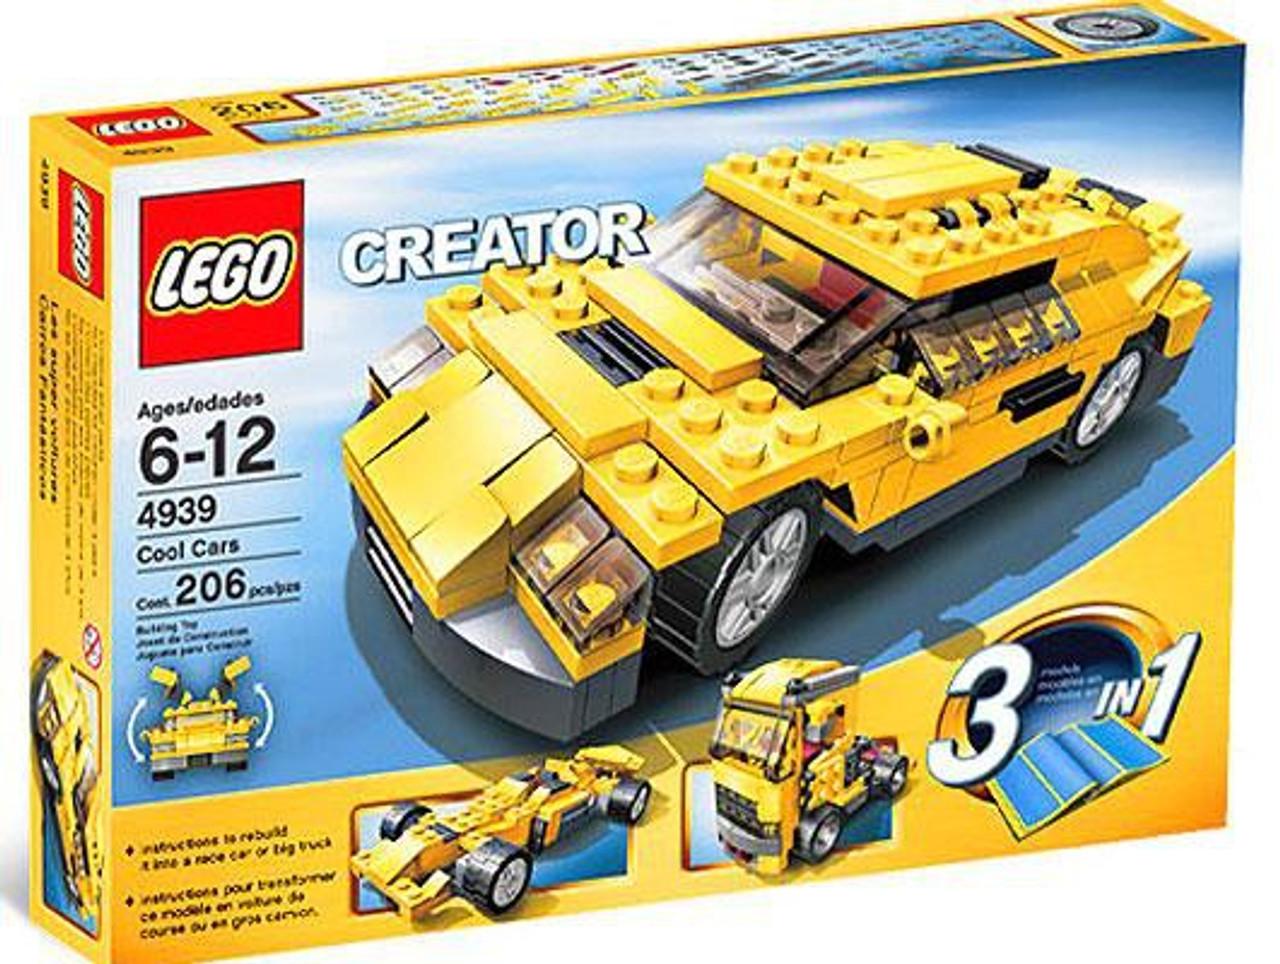 LEGO Creator Cool Cars Set #4939